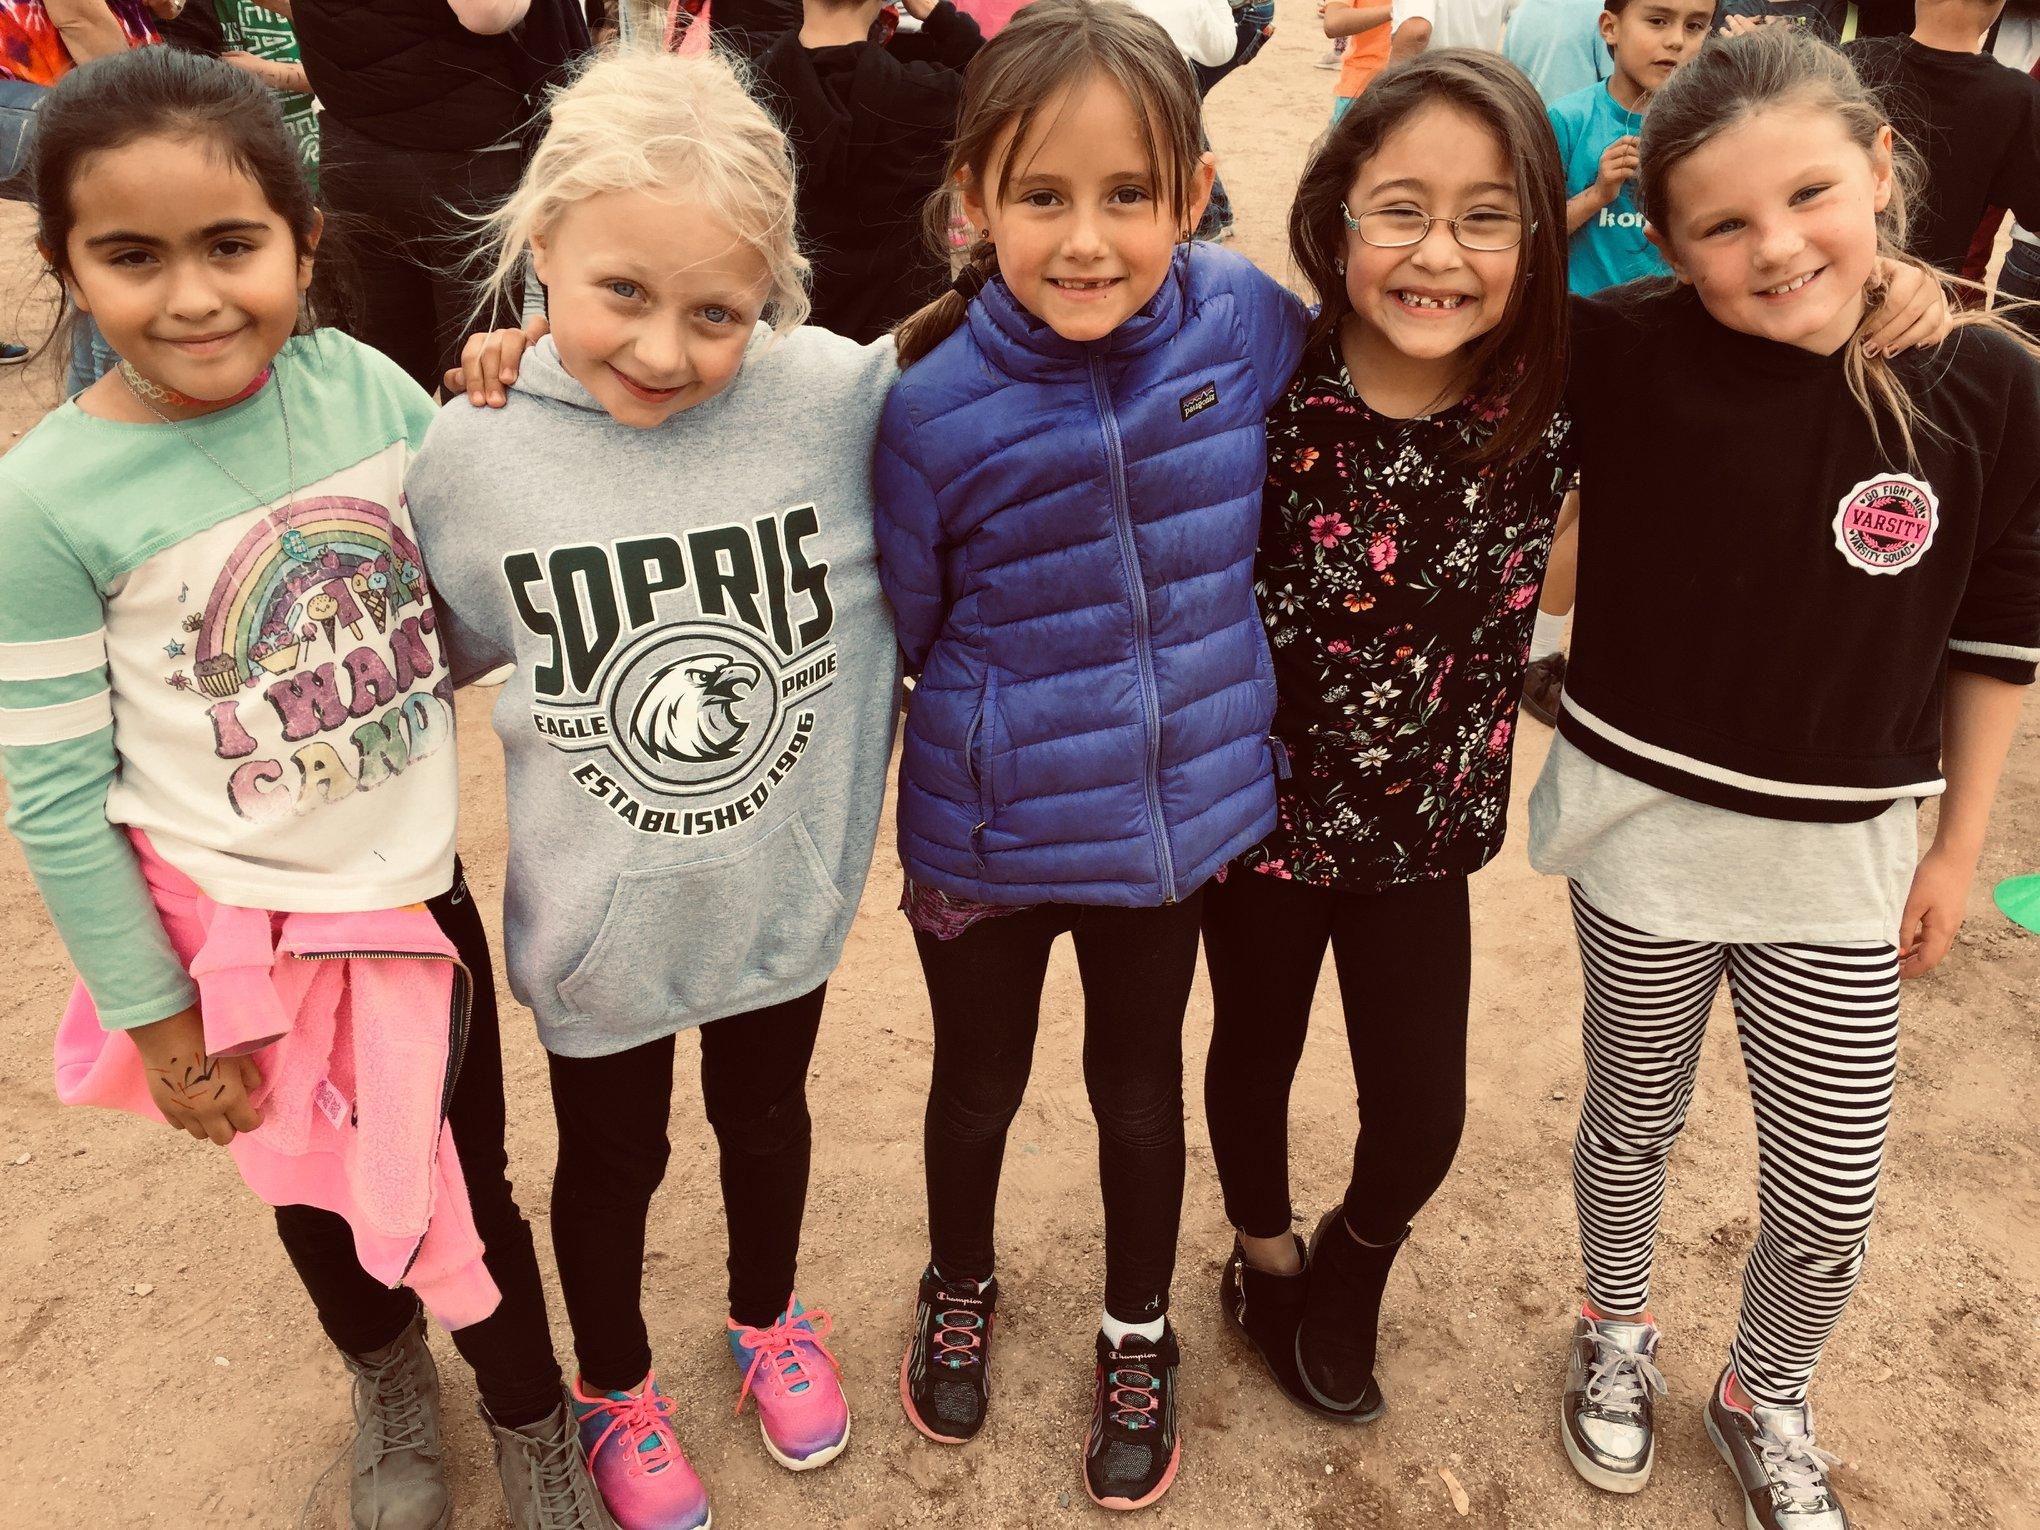 Sopris Elementary School Vision